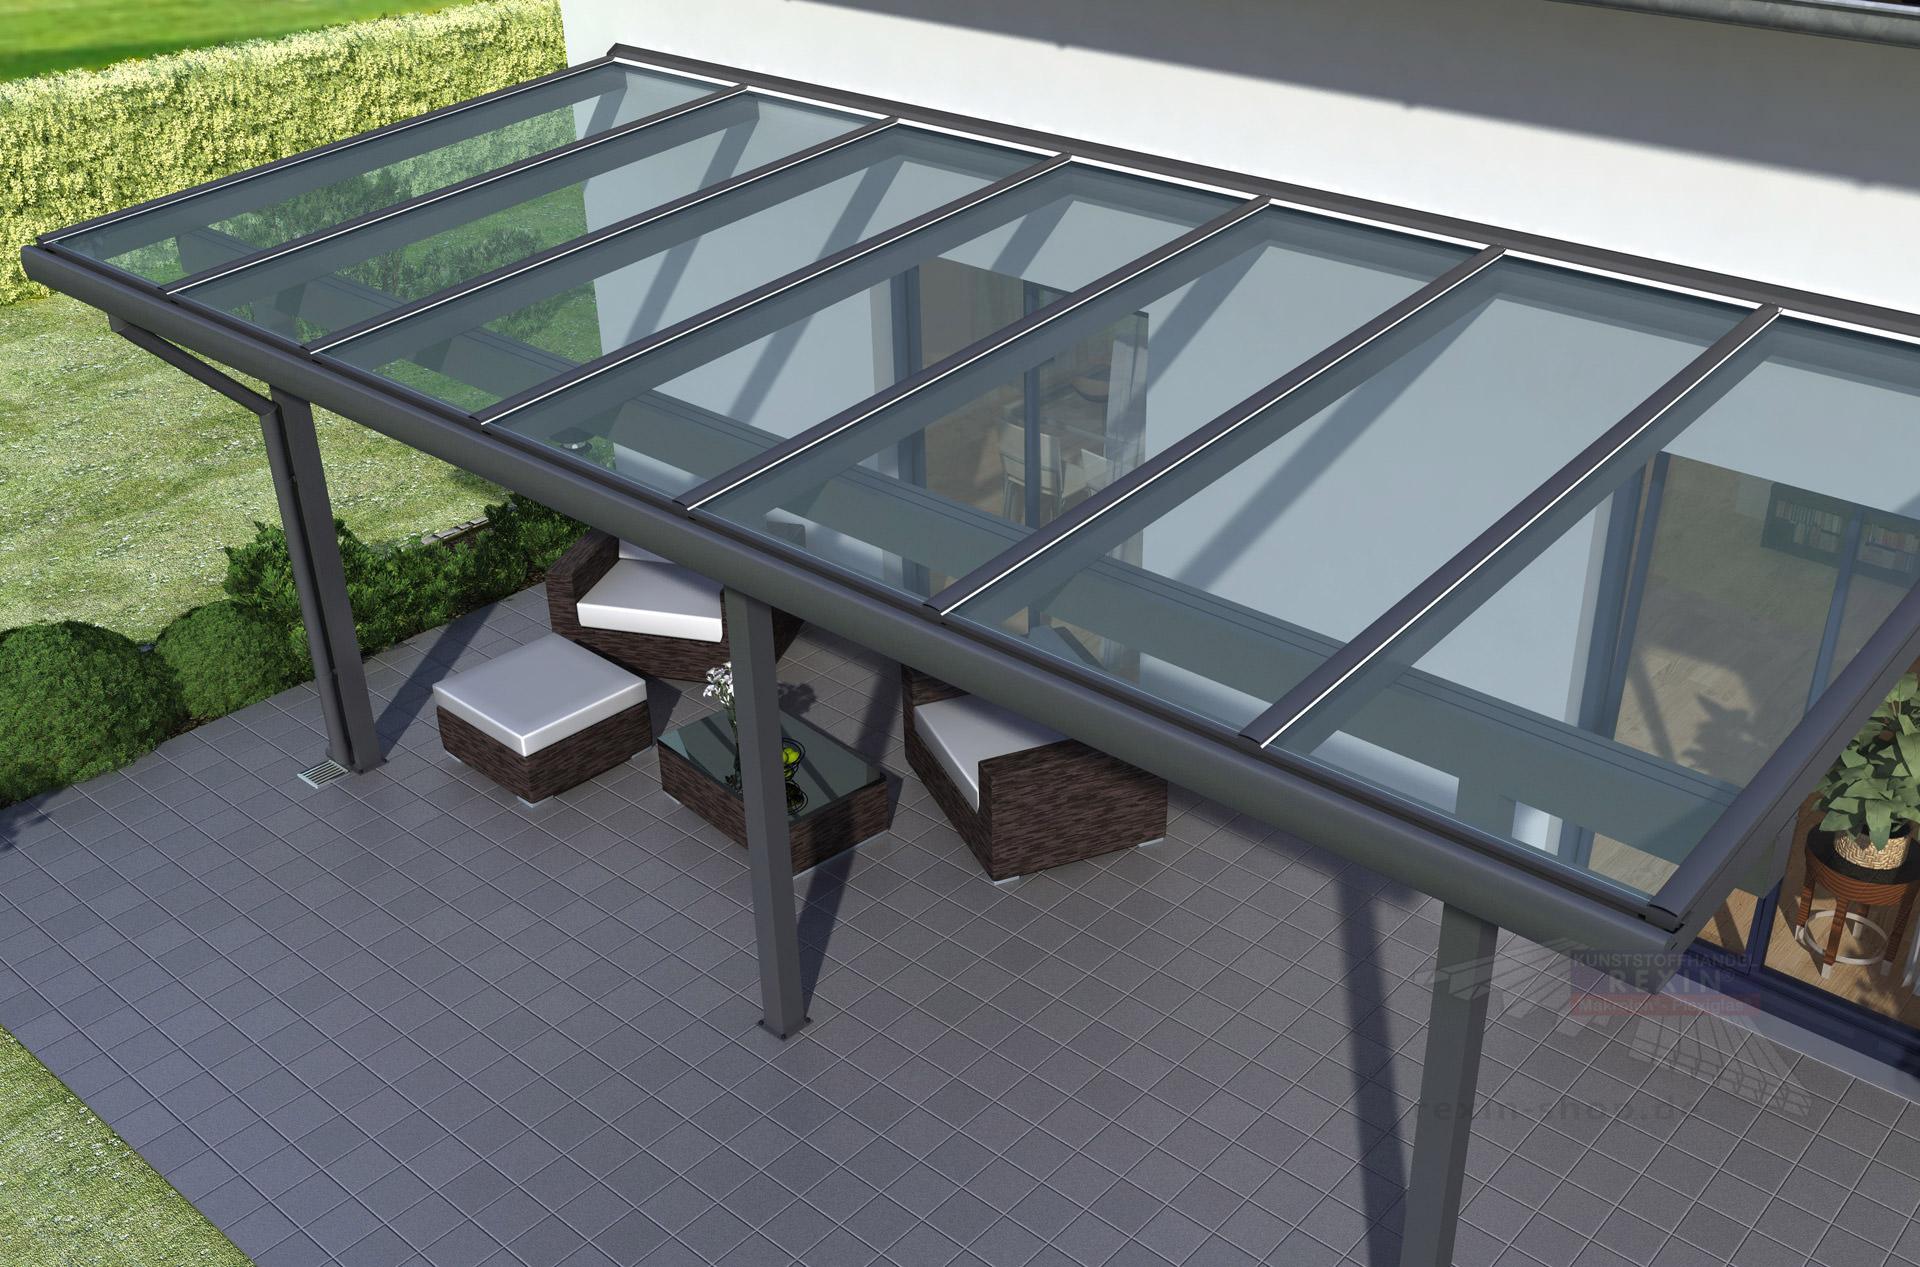 rexoclassic alu terrassen berdachung 9m x 3m vsg glas. Black Bedroom Furniture Sets. Home Design Ideas